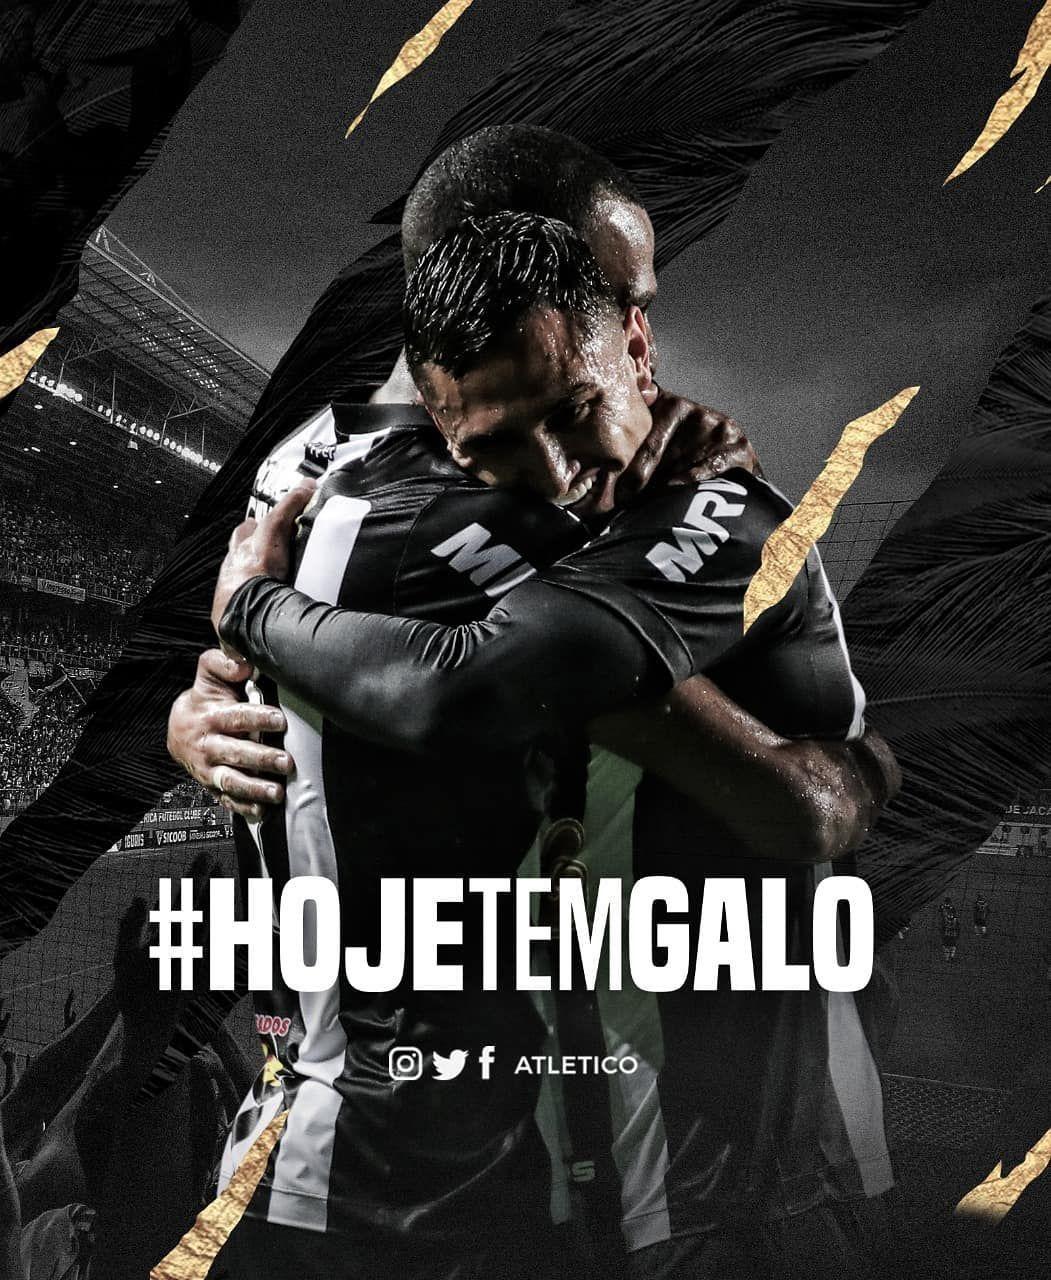 Hoje Tem Galo Omaiorcampeaomineiro Defende A Lideranca Do Estadual Galo Villa Nova Campeonato Mineir Clube Atletico Mineiro Atletico Galoucura